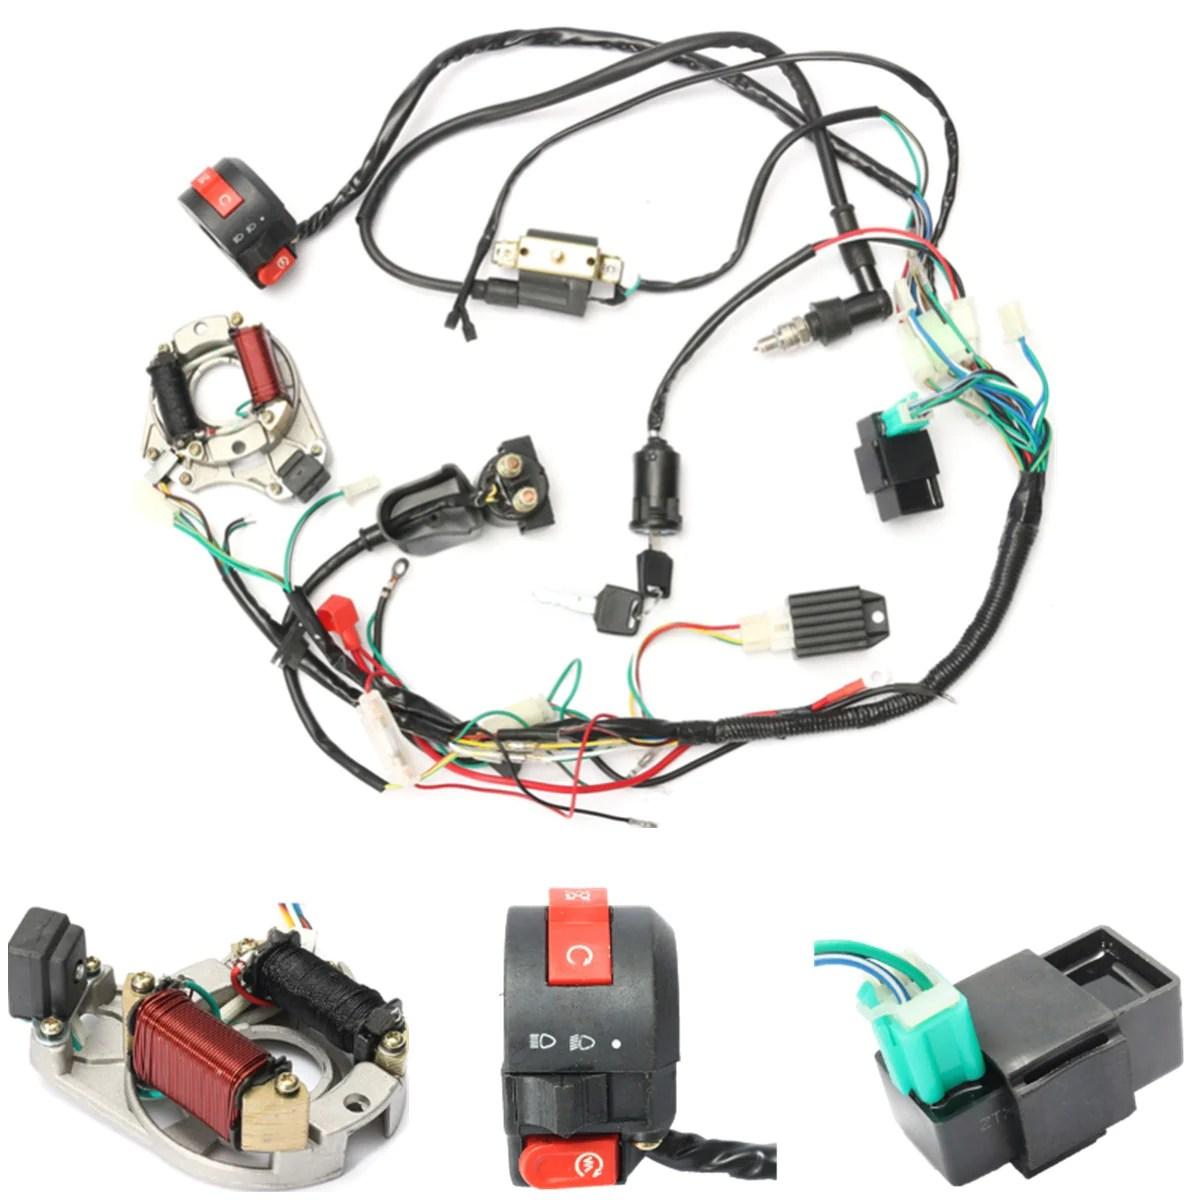 hight resolution of kymco cdi box ac plug wiring harness wiring diagram progresif cdi 25km kymco peugeot sym 50cc